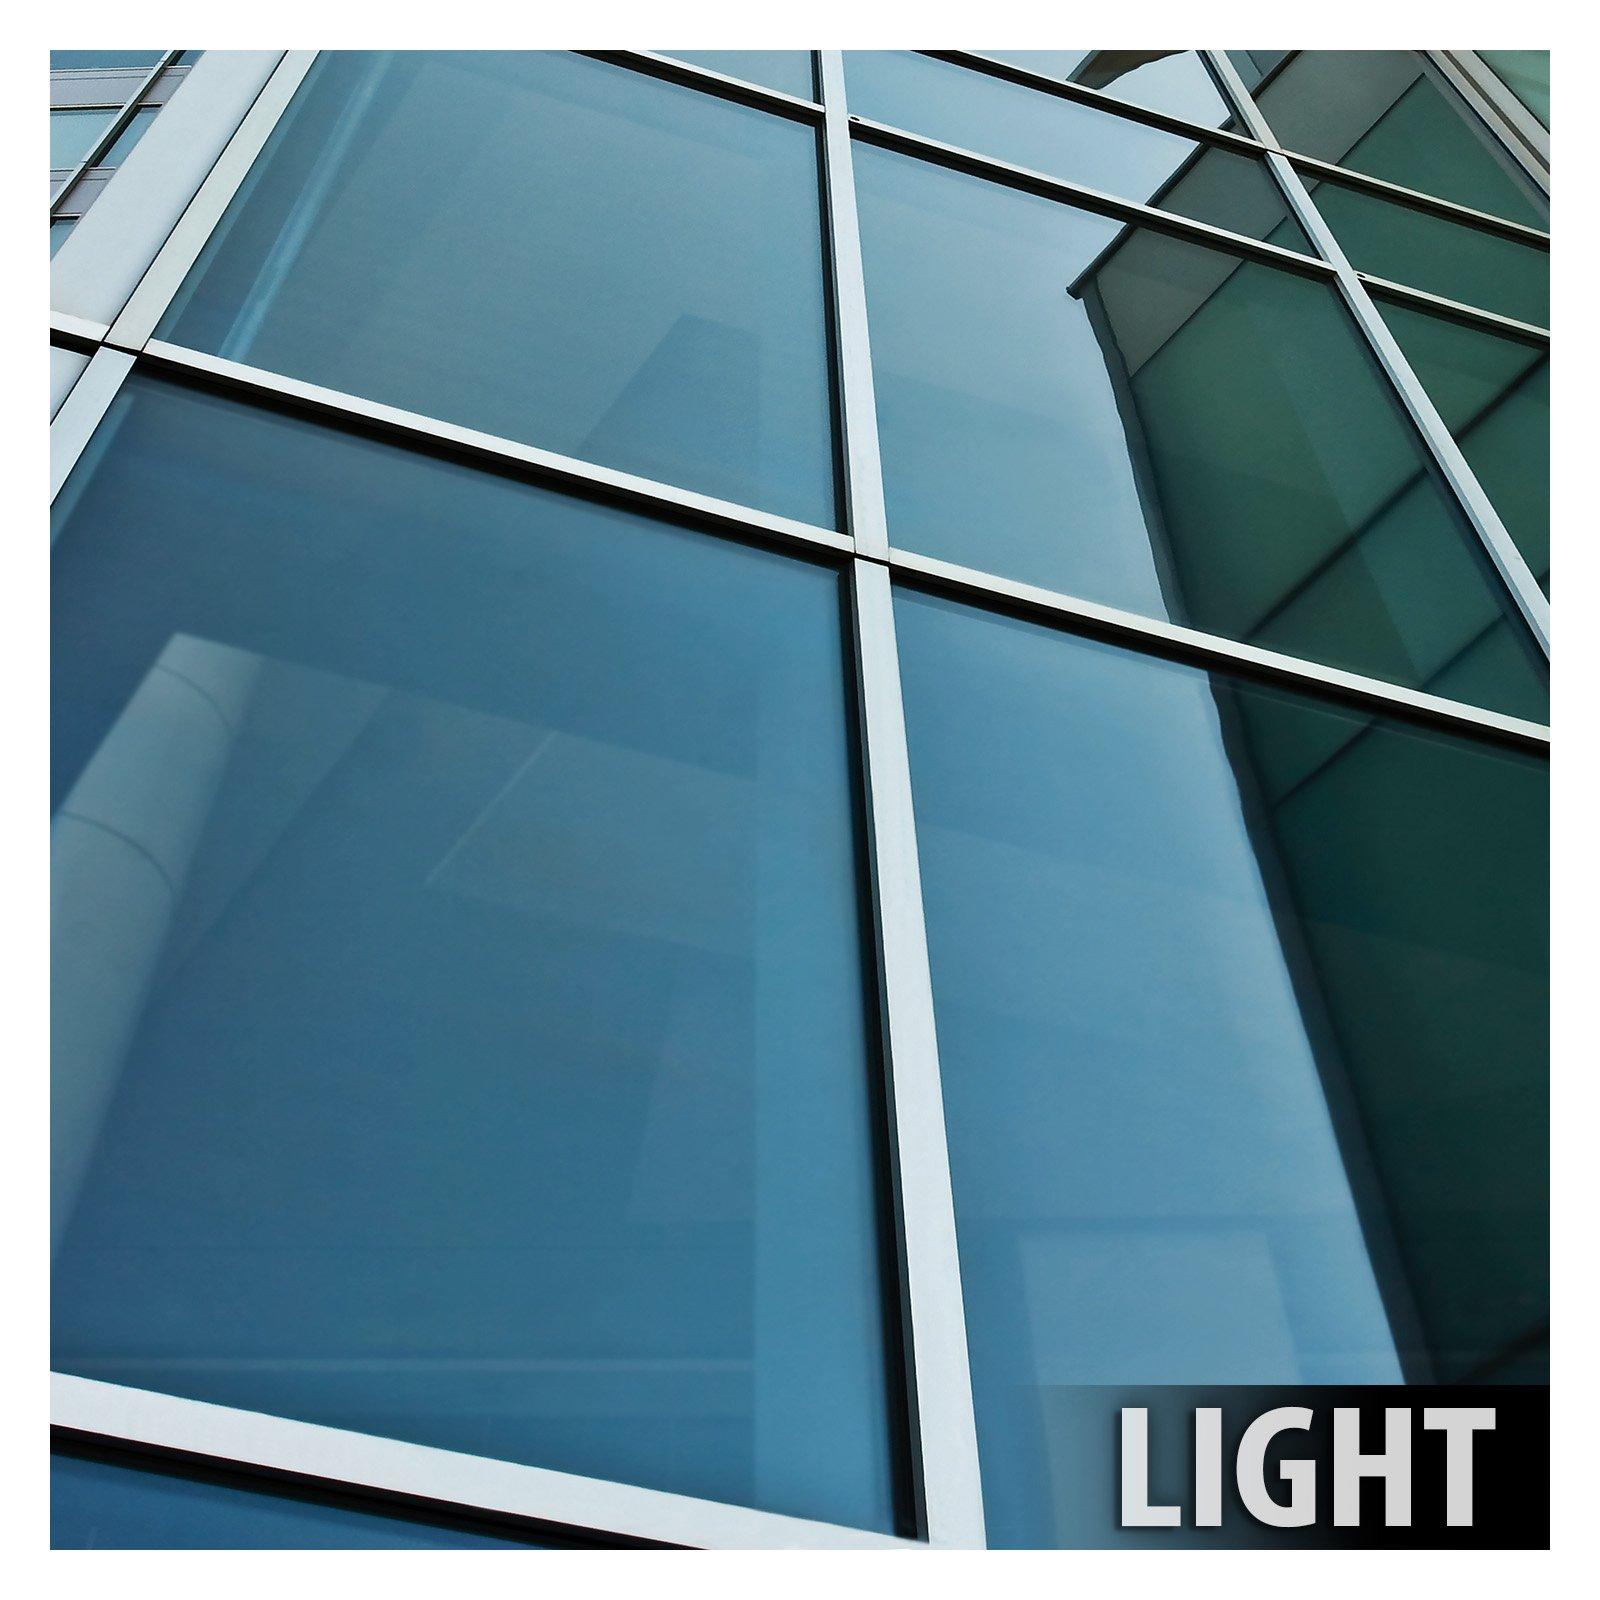 BDF NA50 Window Film Sun Control and Heat Rejection N50, Black (Light) - 36in X 50ft